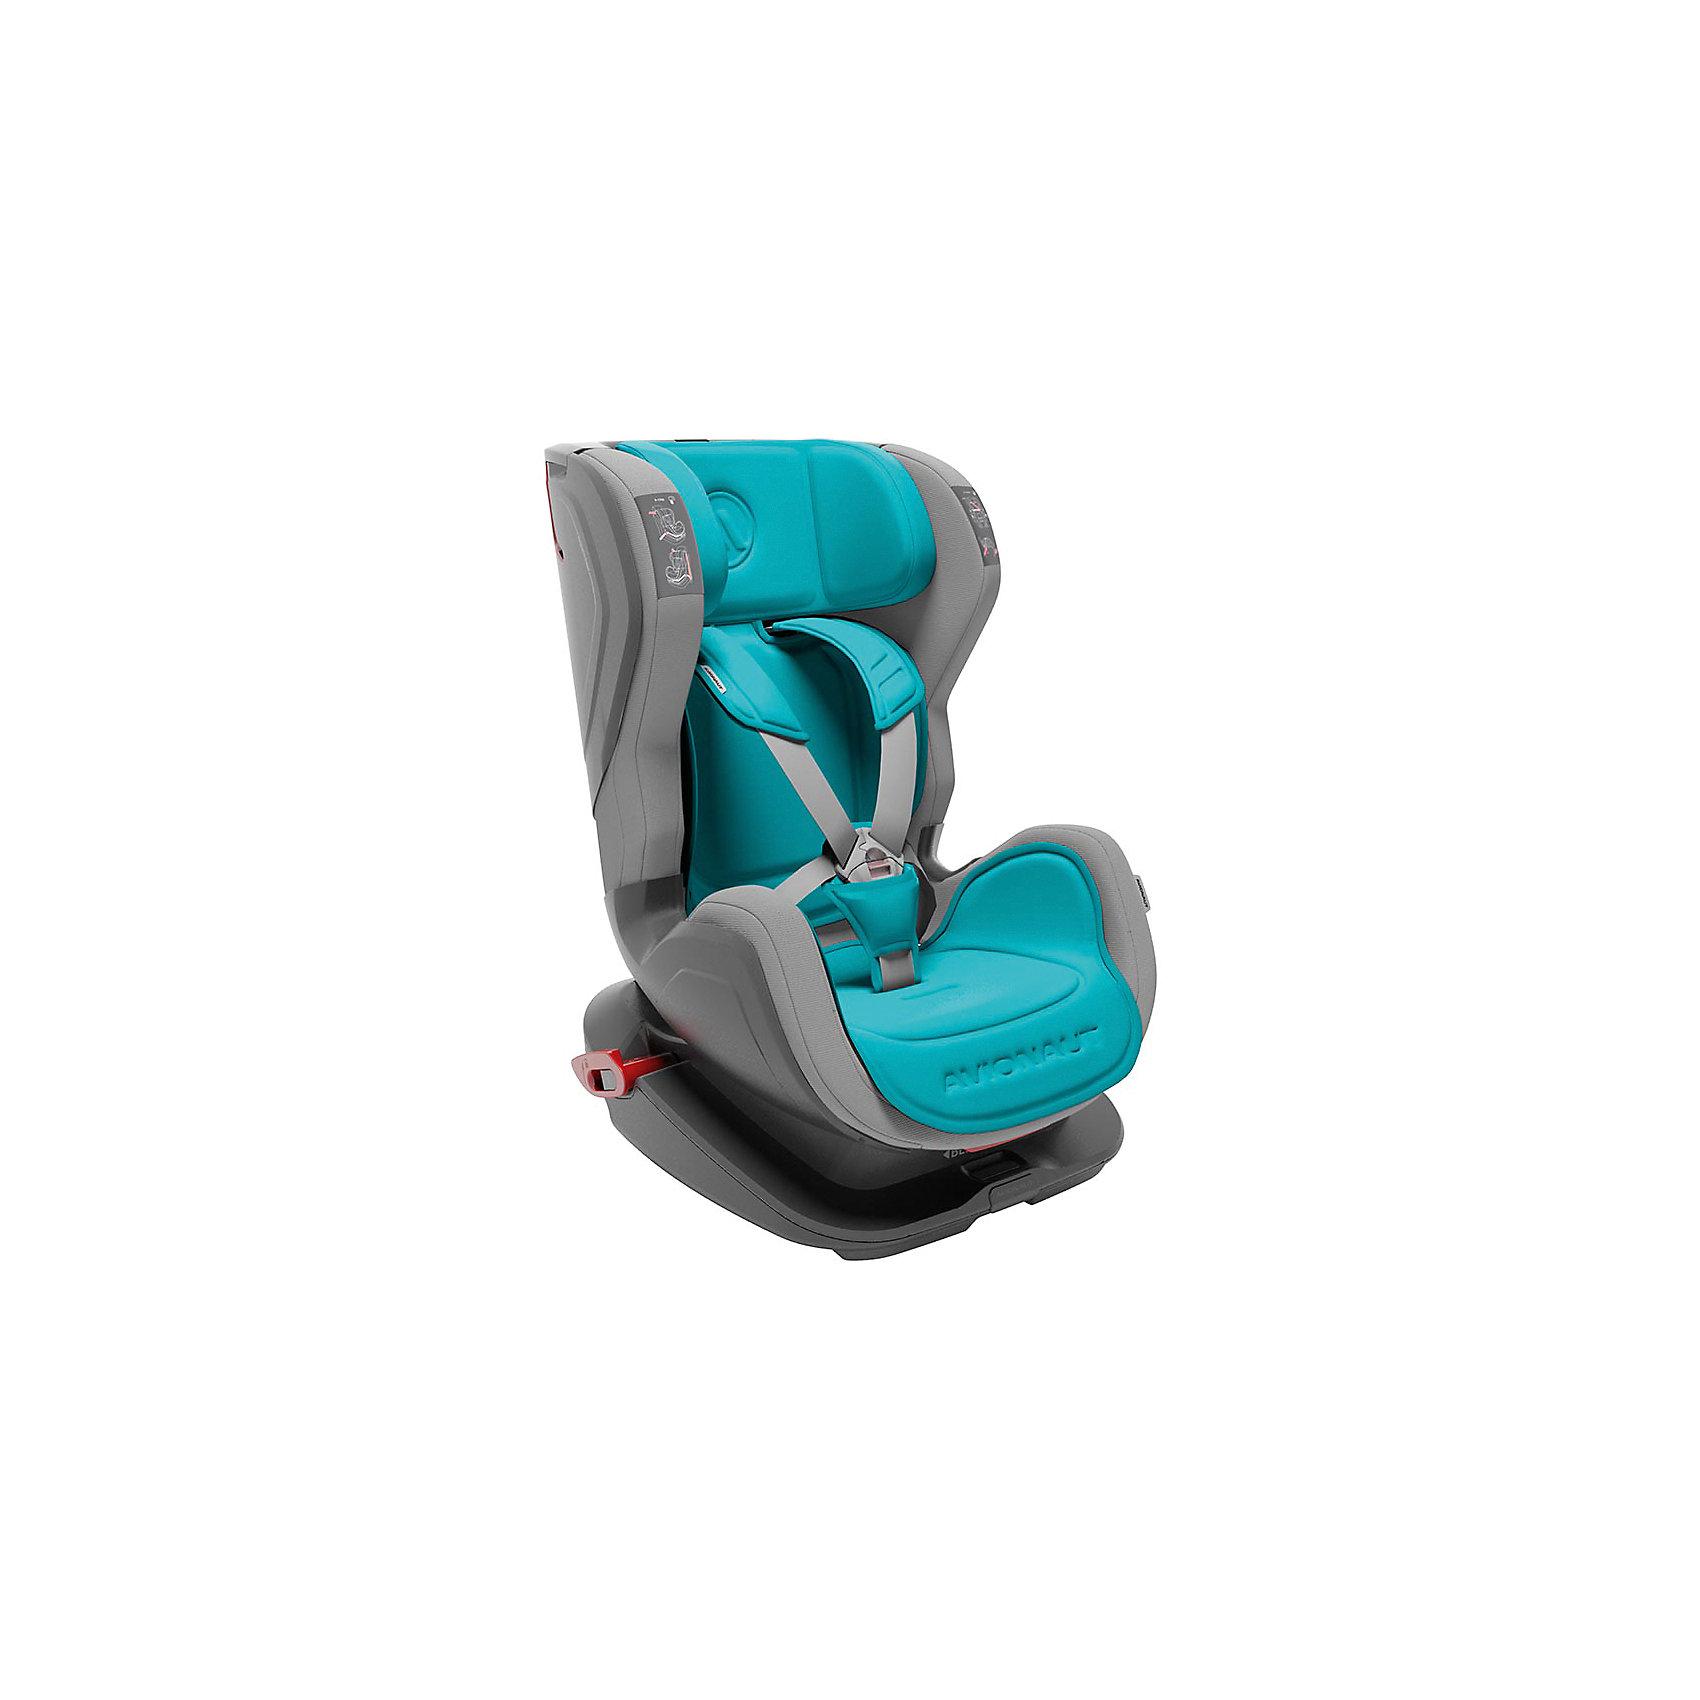 Автокресло Avionaut GLIDER, 9-25кг, голубой/серый